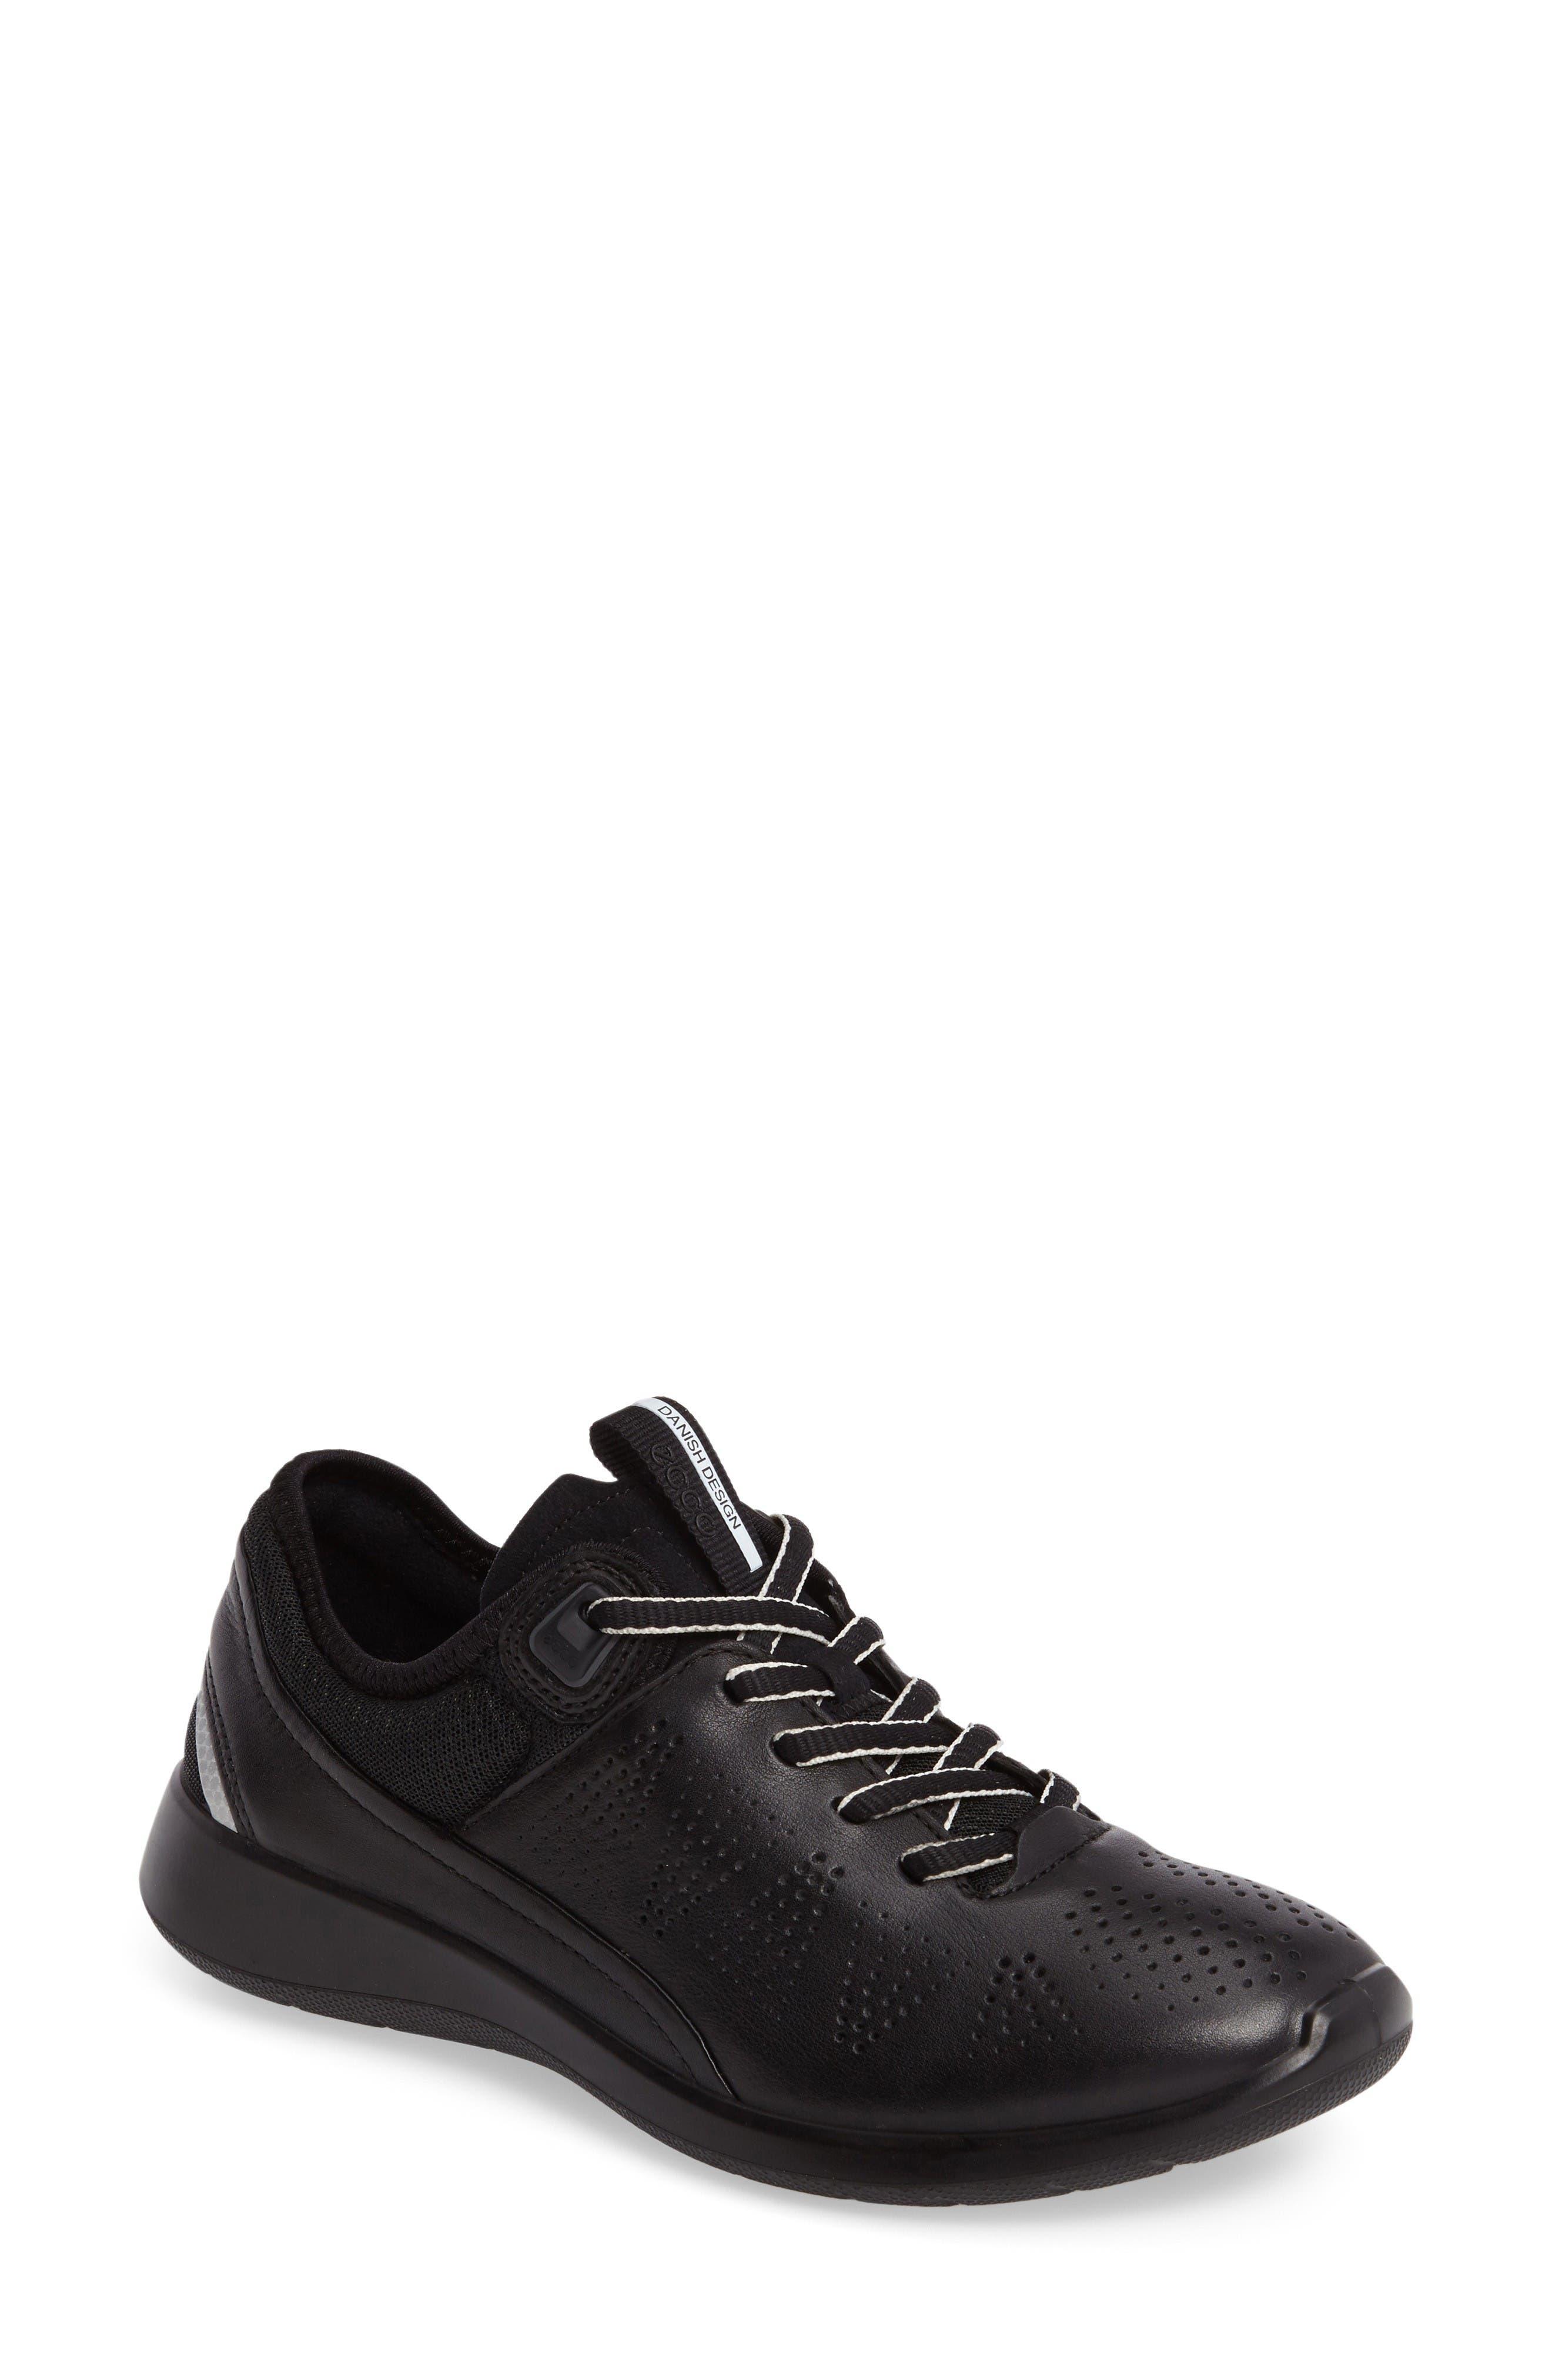 Alternate Image 1 Selected - ECCO Soft 5 Sneaker (Women)